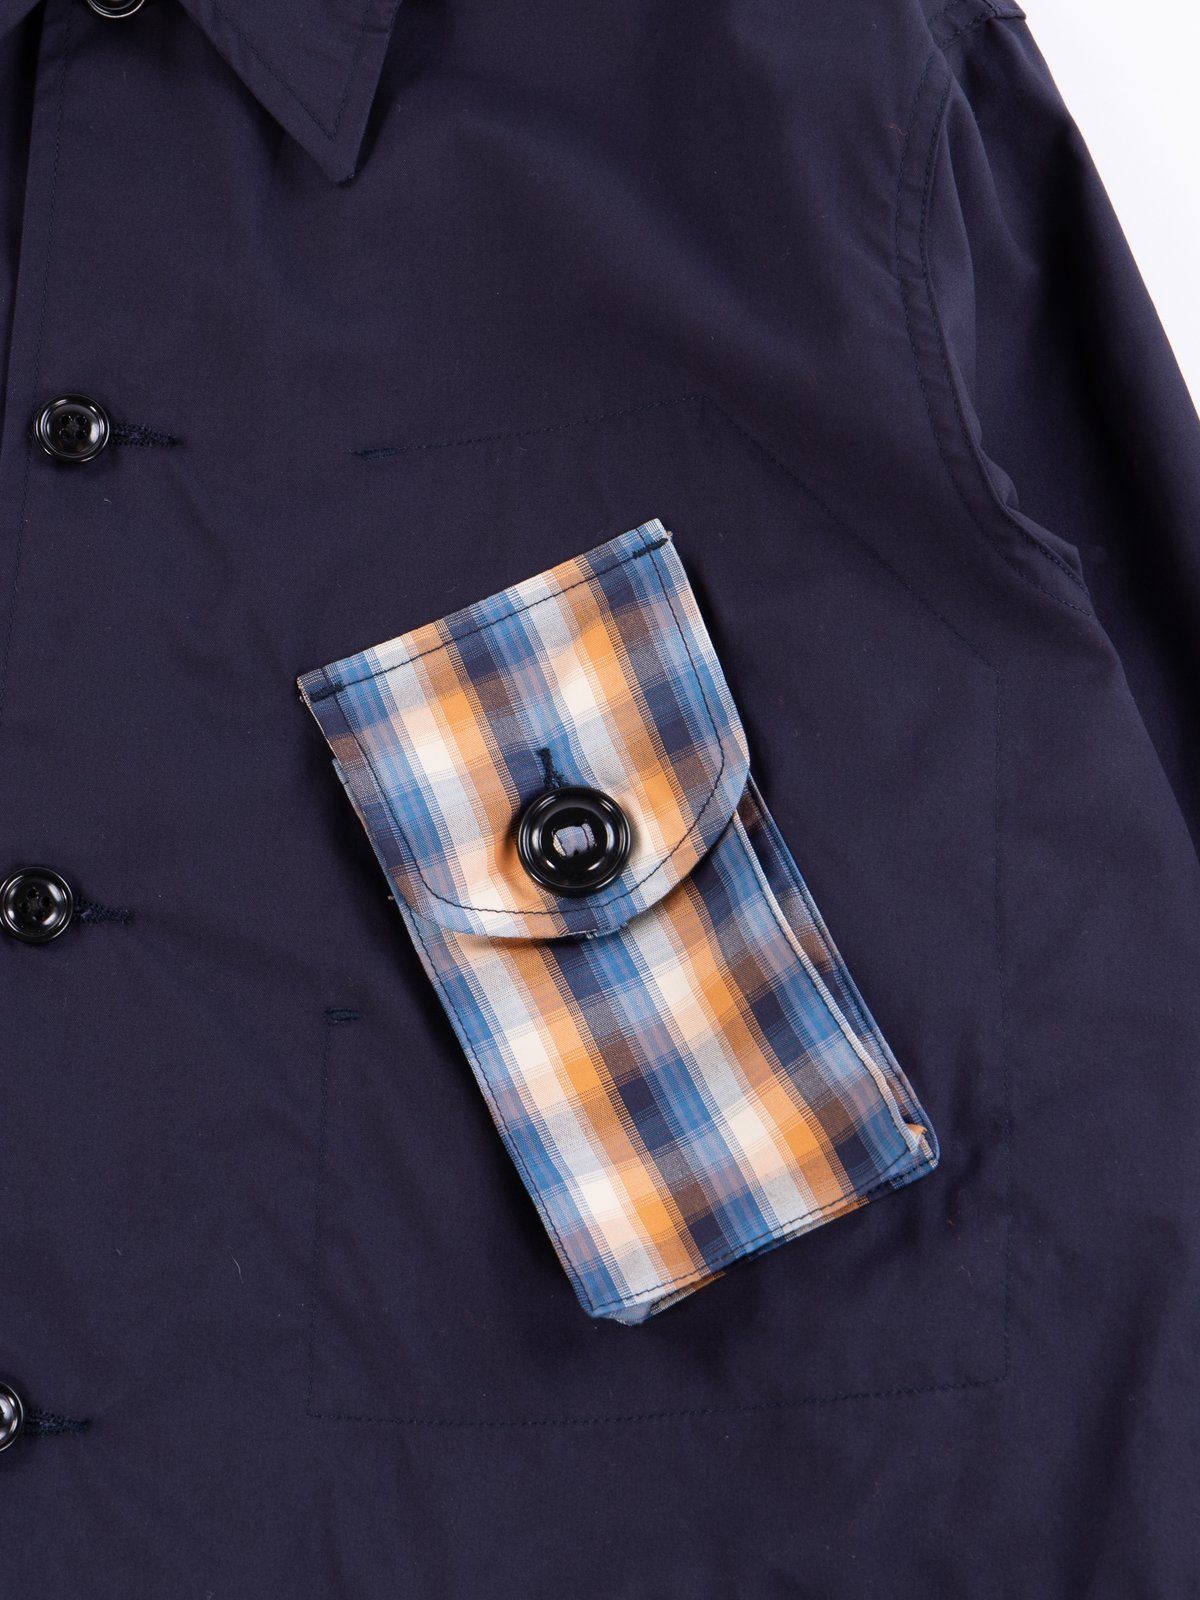 Navy Vancloth Oxford Military Half Coat Type B Exclusive - Image 4